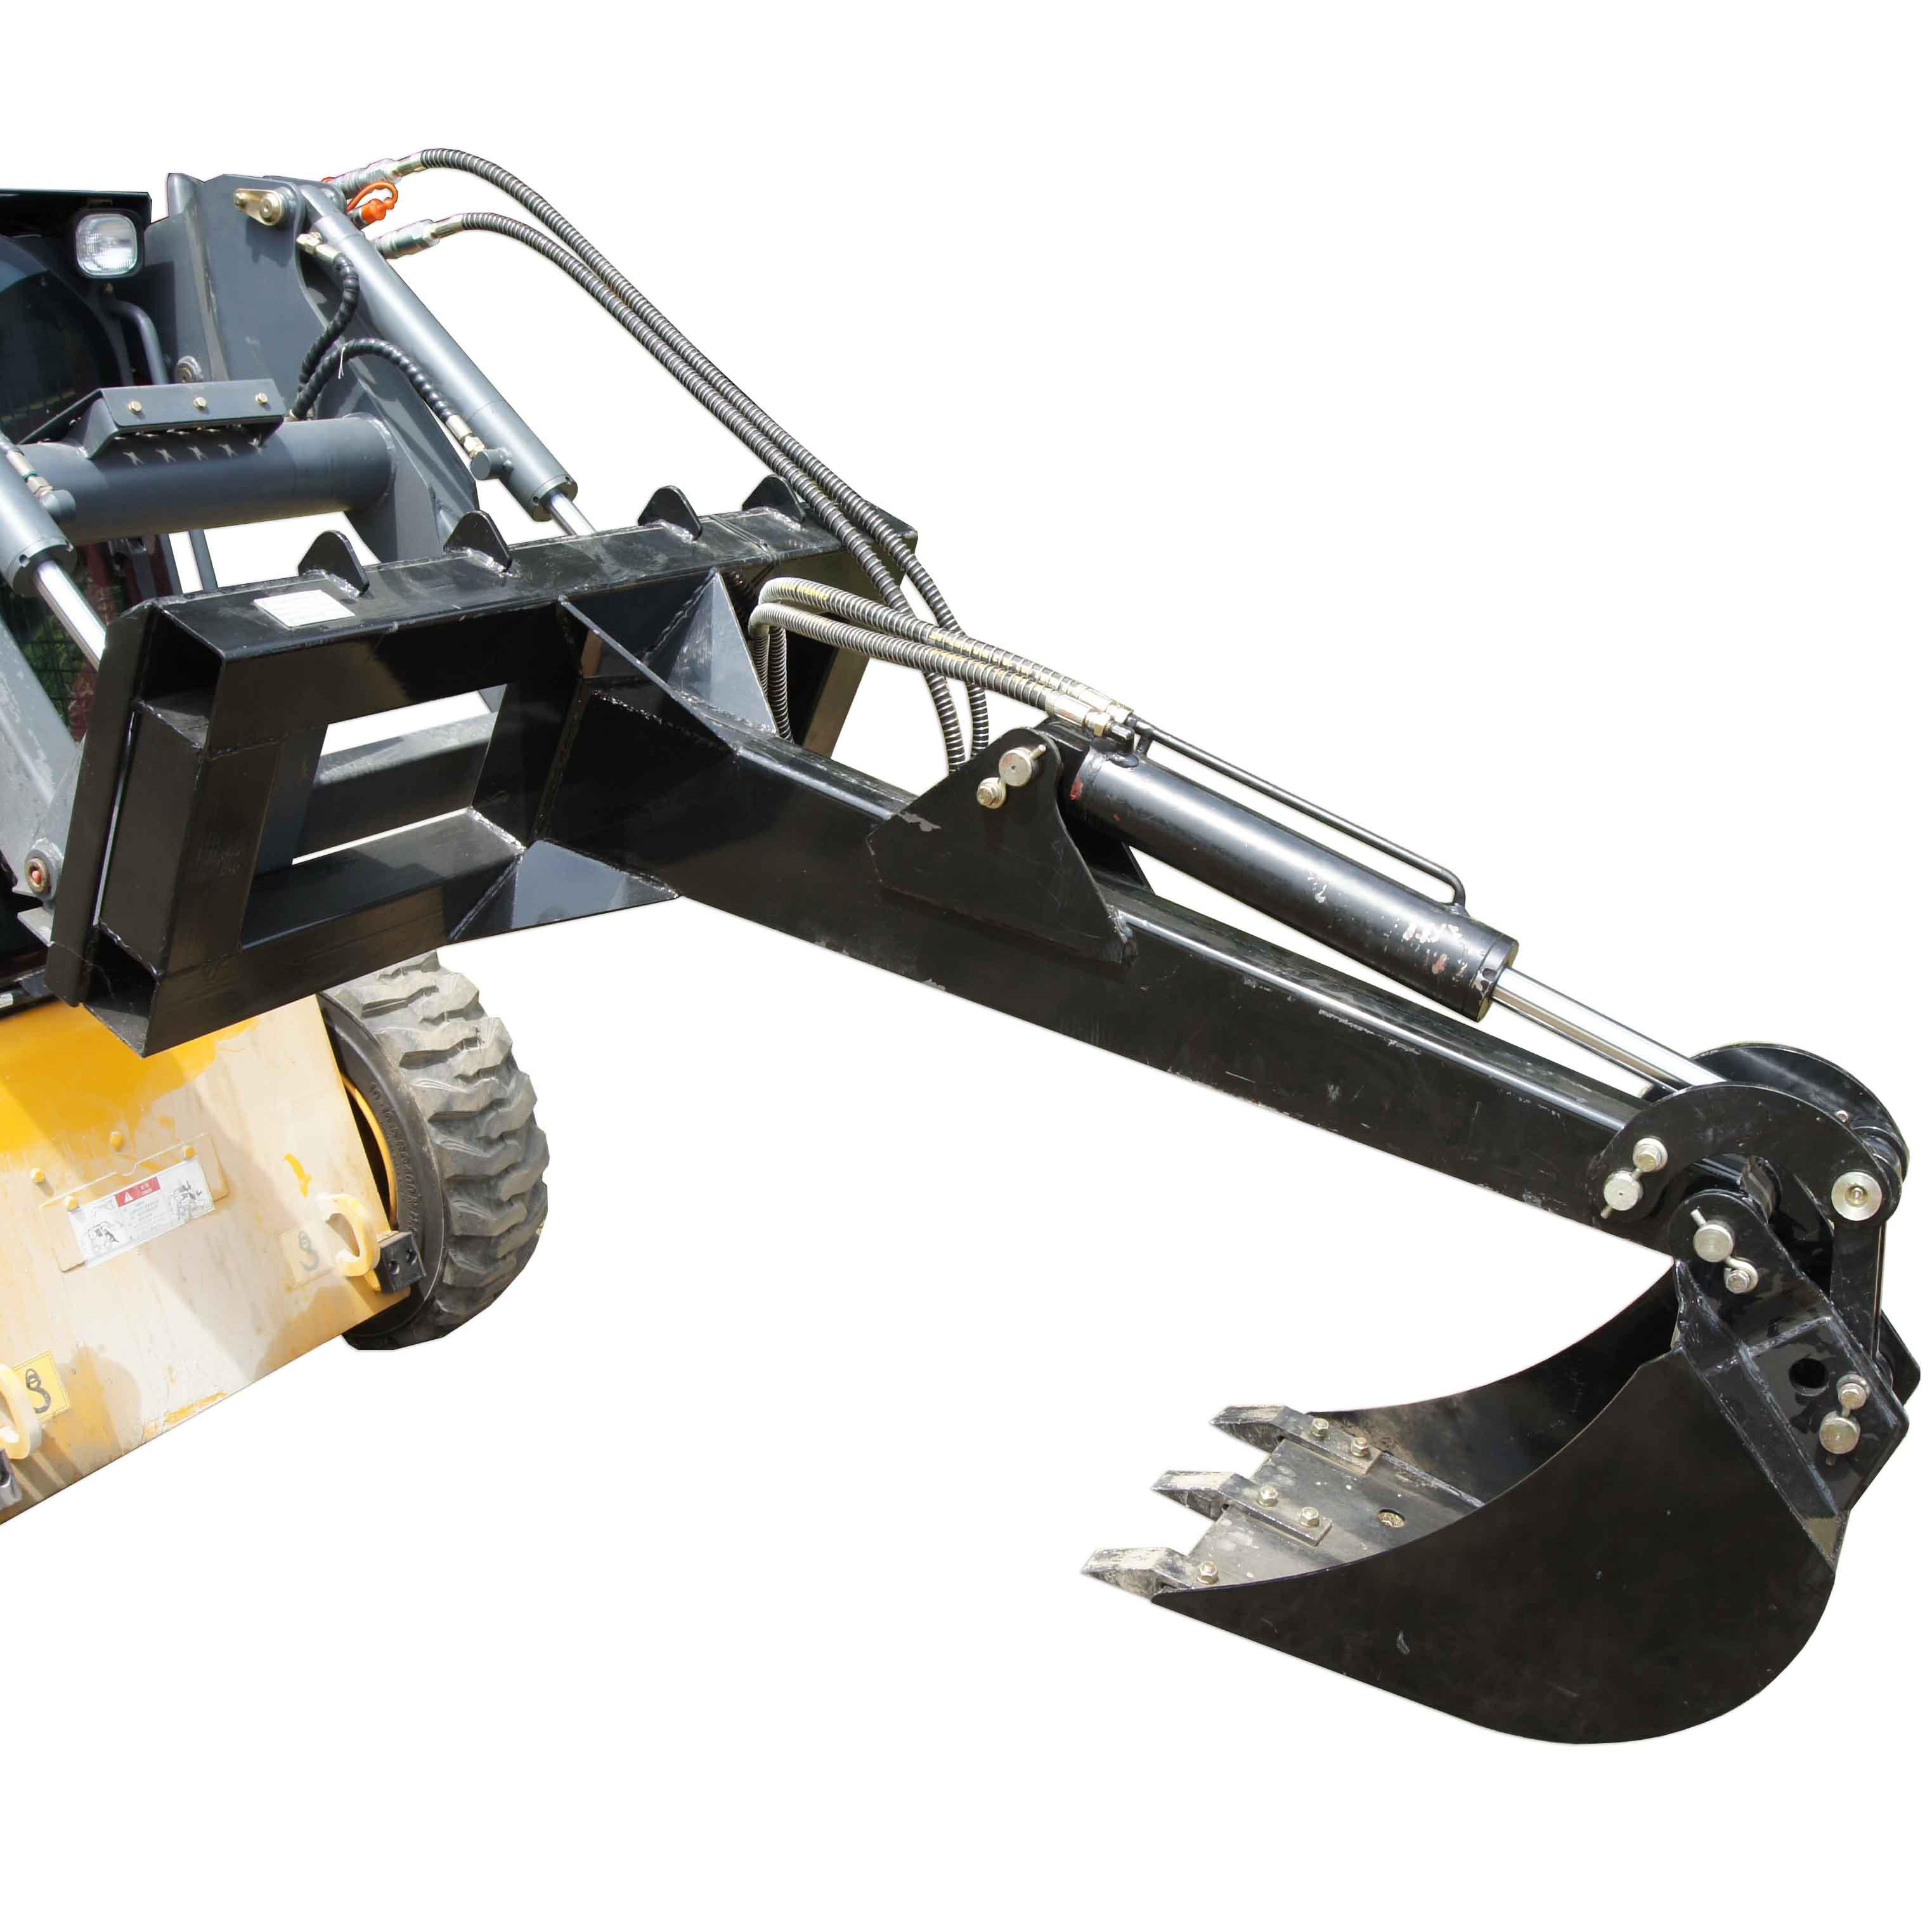 "Skid steer Backhoe Fronthoe 16"" Bucket Excavator Attachment Bobcat Loader Titan"